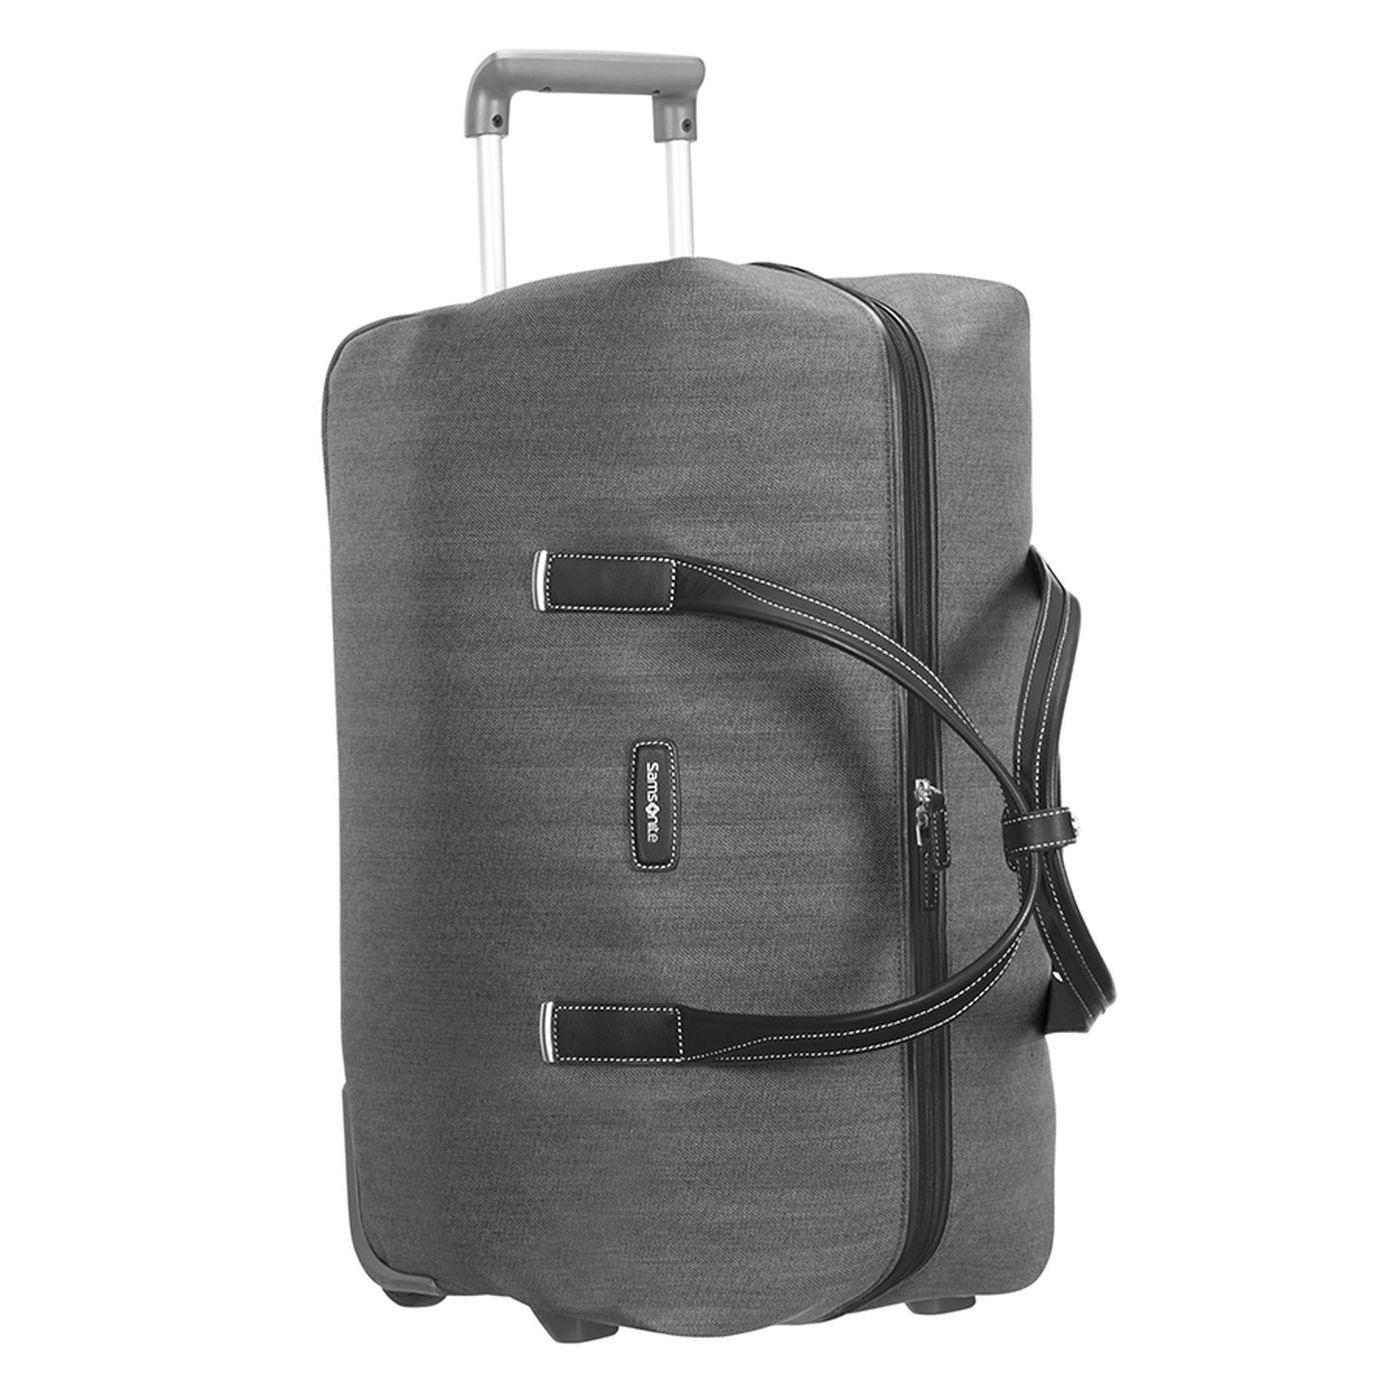 0a52d949f3 Cestovná taška Samsonite Lite DLX Duffle WH 55 64D 006 - INBAG.sk